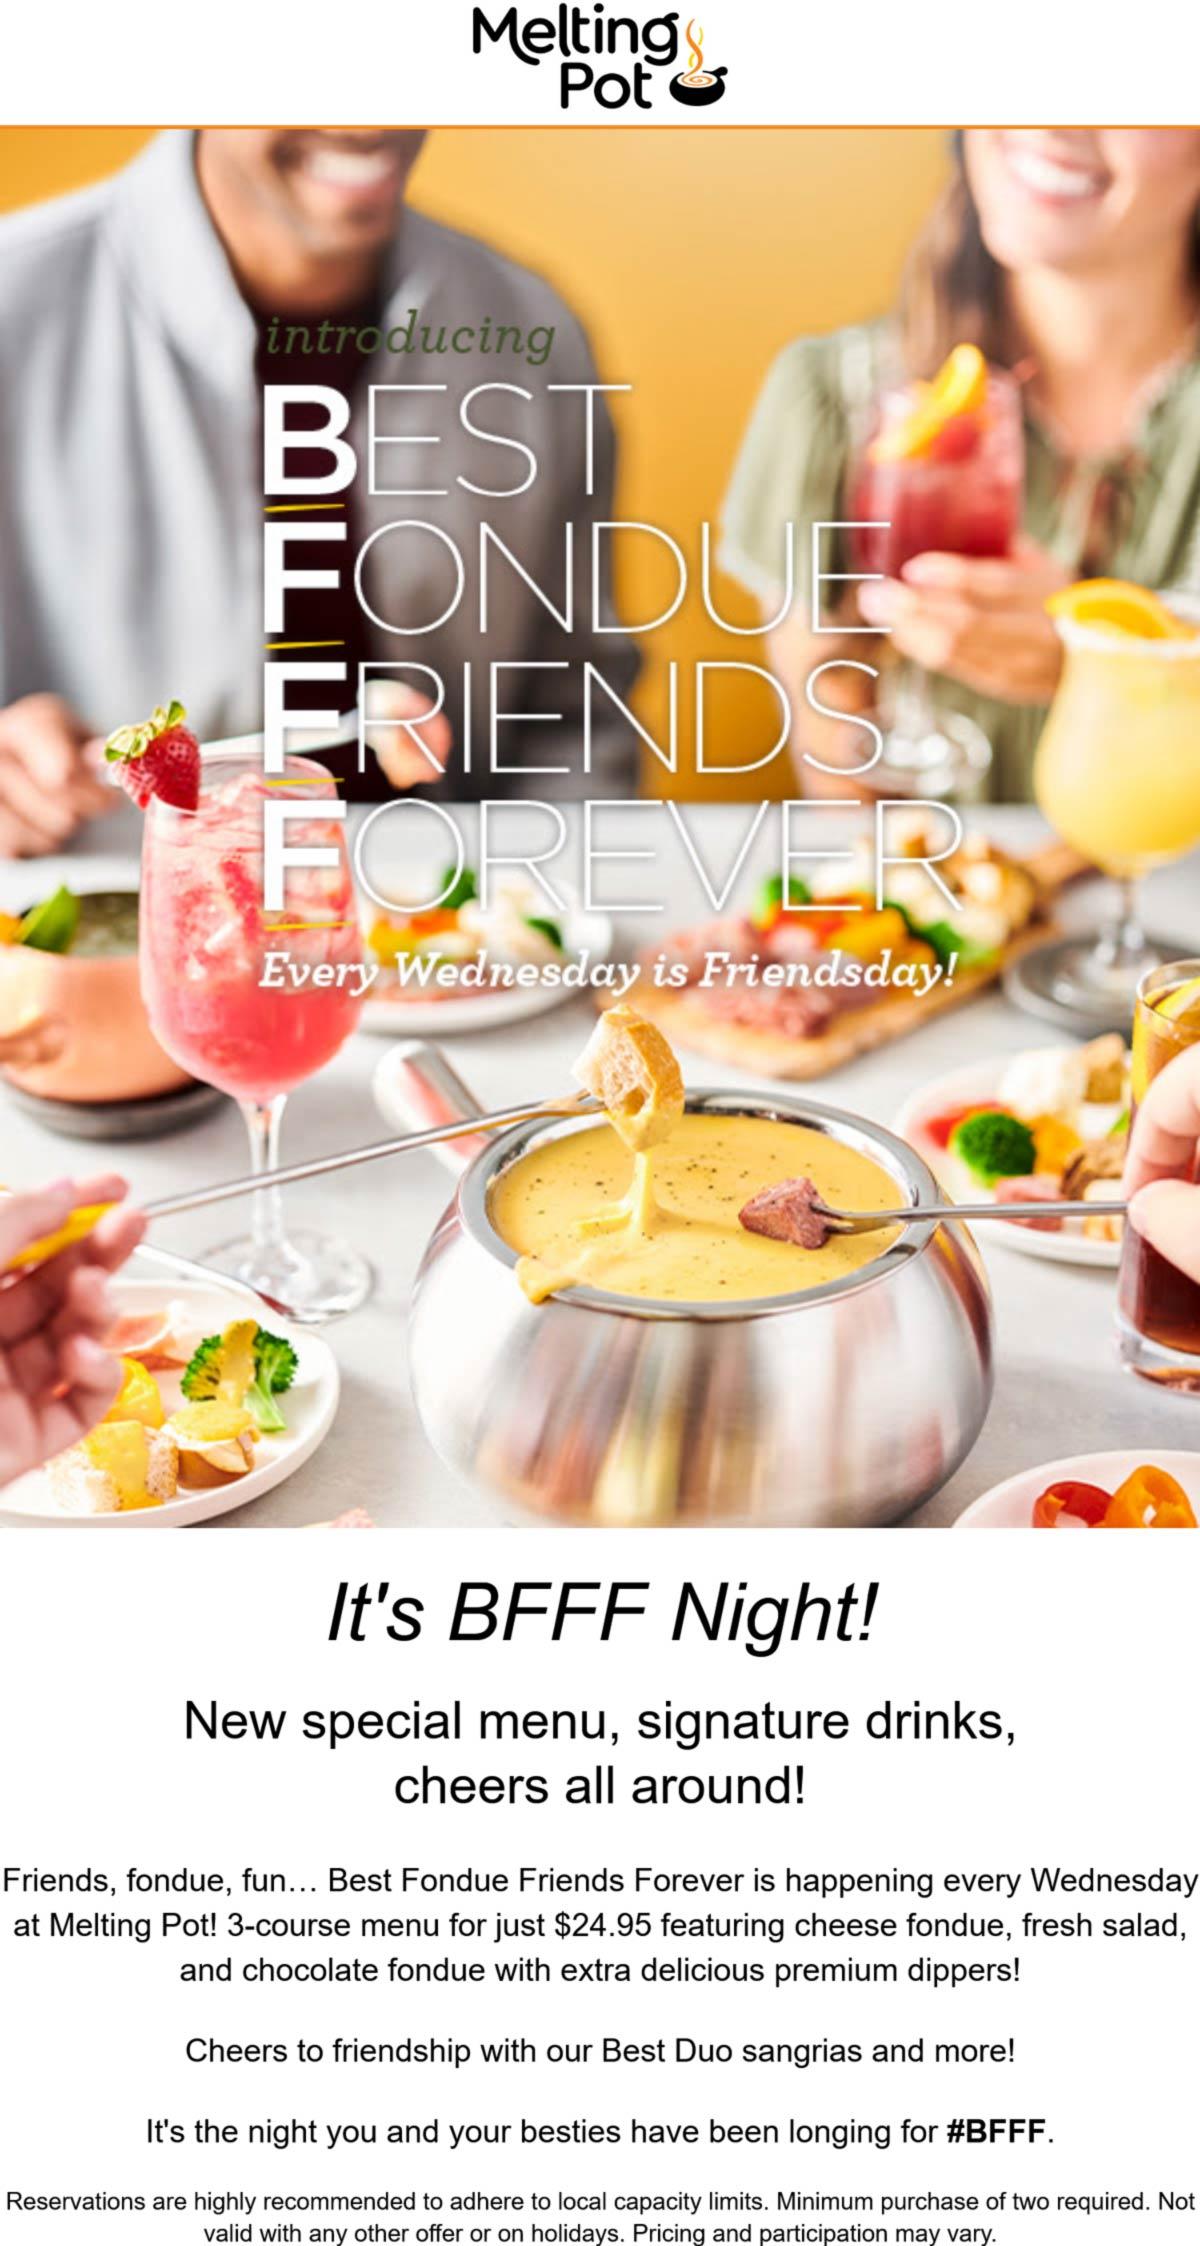 Melting Pot restaurants Coupon  3-course fondue & salad menu for $25 Wednesdays at Melting Pot restaurants #meltingpot